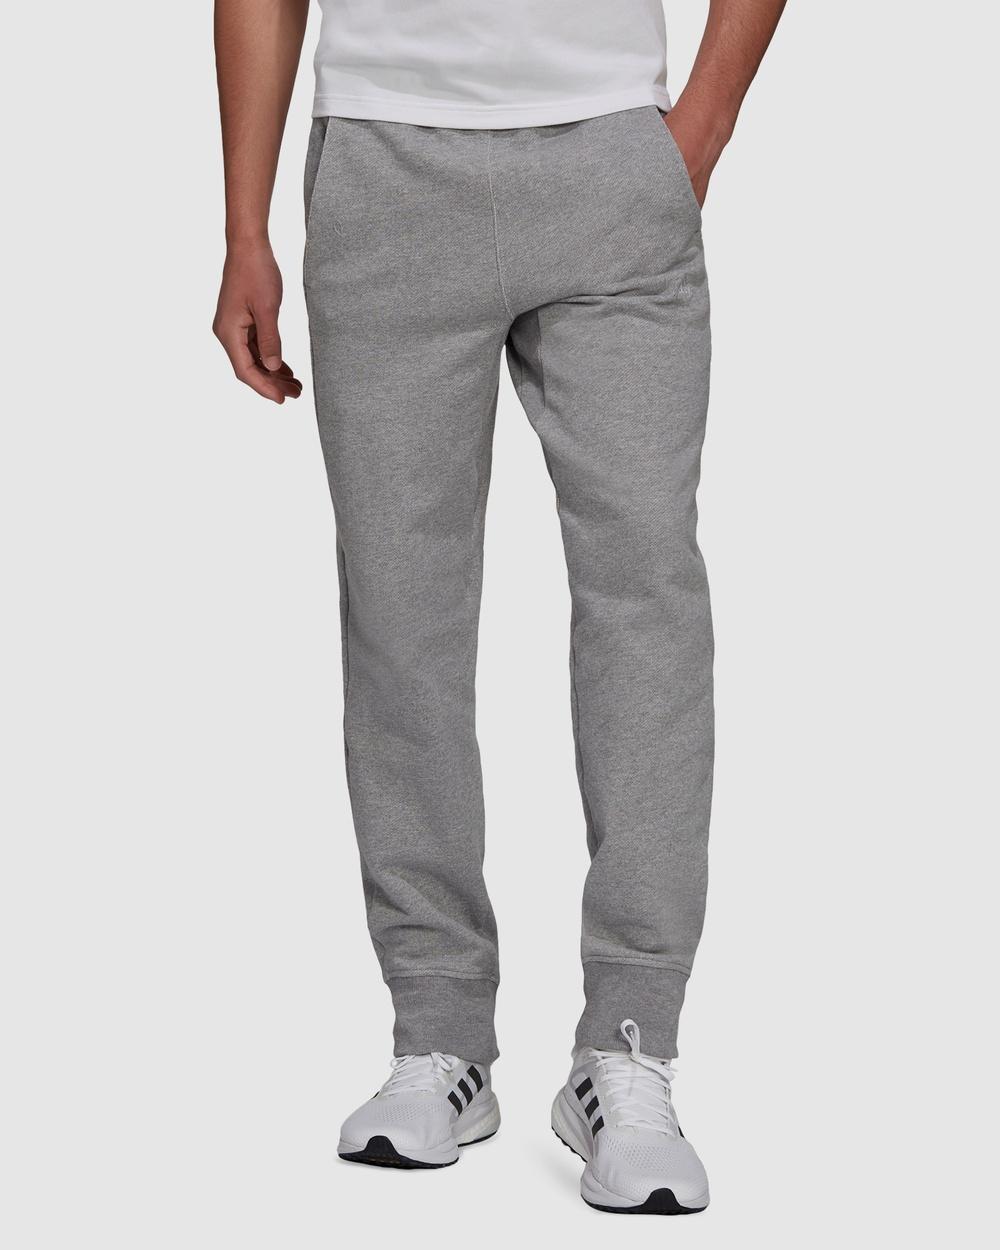 adidas Performance Sportswear Comfy & Chill Pants Grey